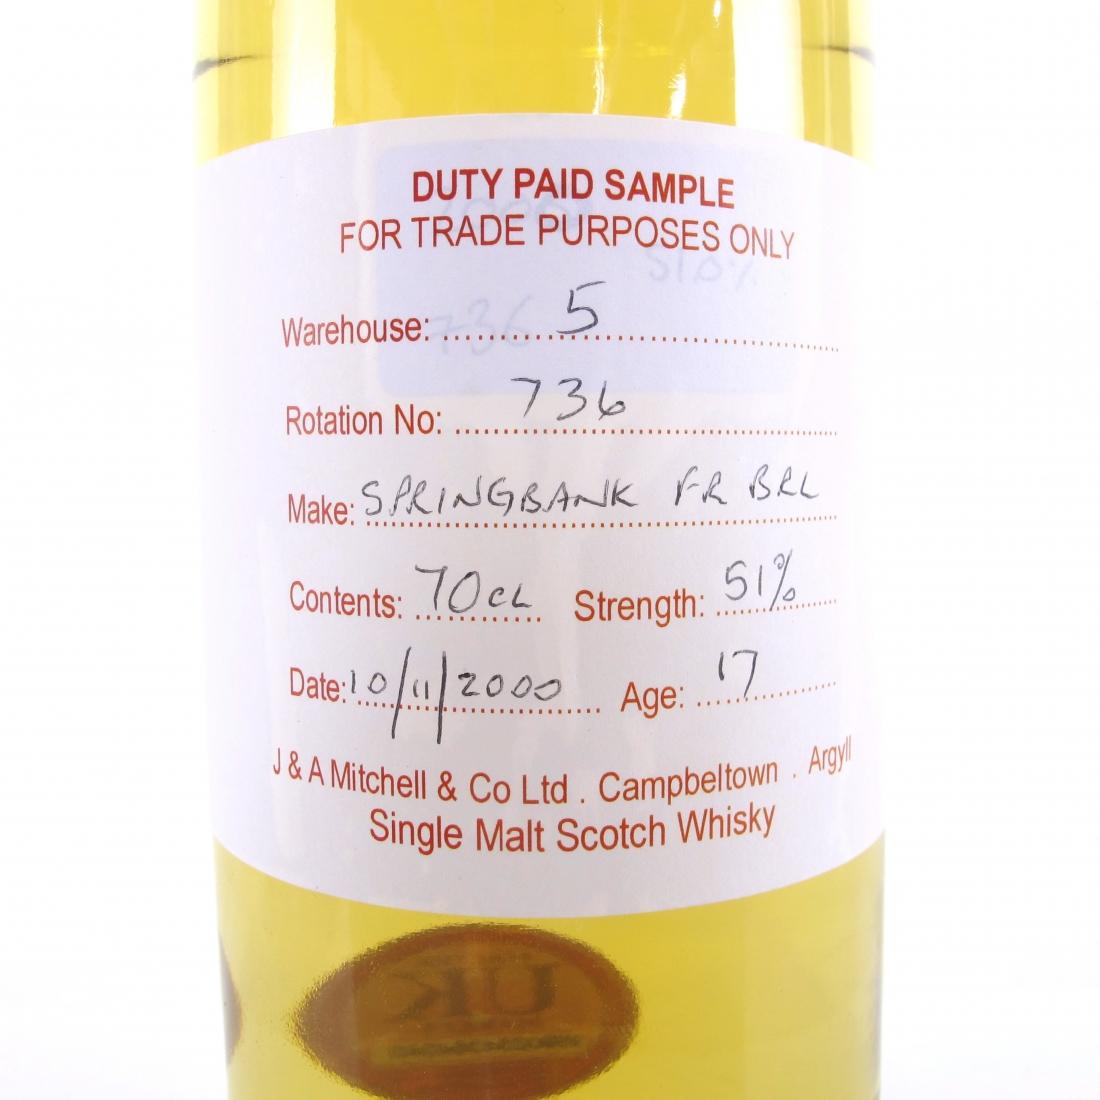 Springbank 2000 Duty Paid Sample 17 Year Old / Fresh Rum Barrel